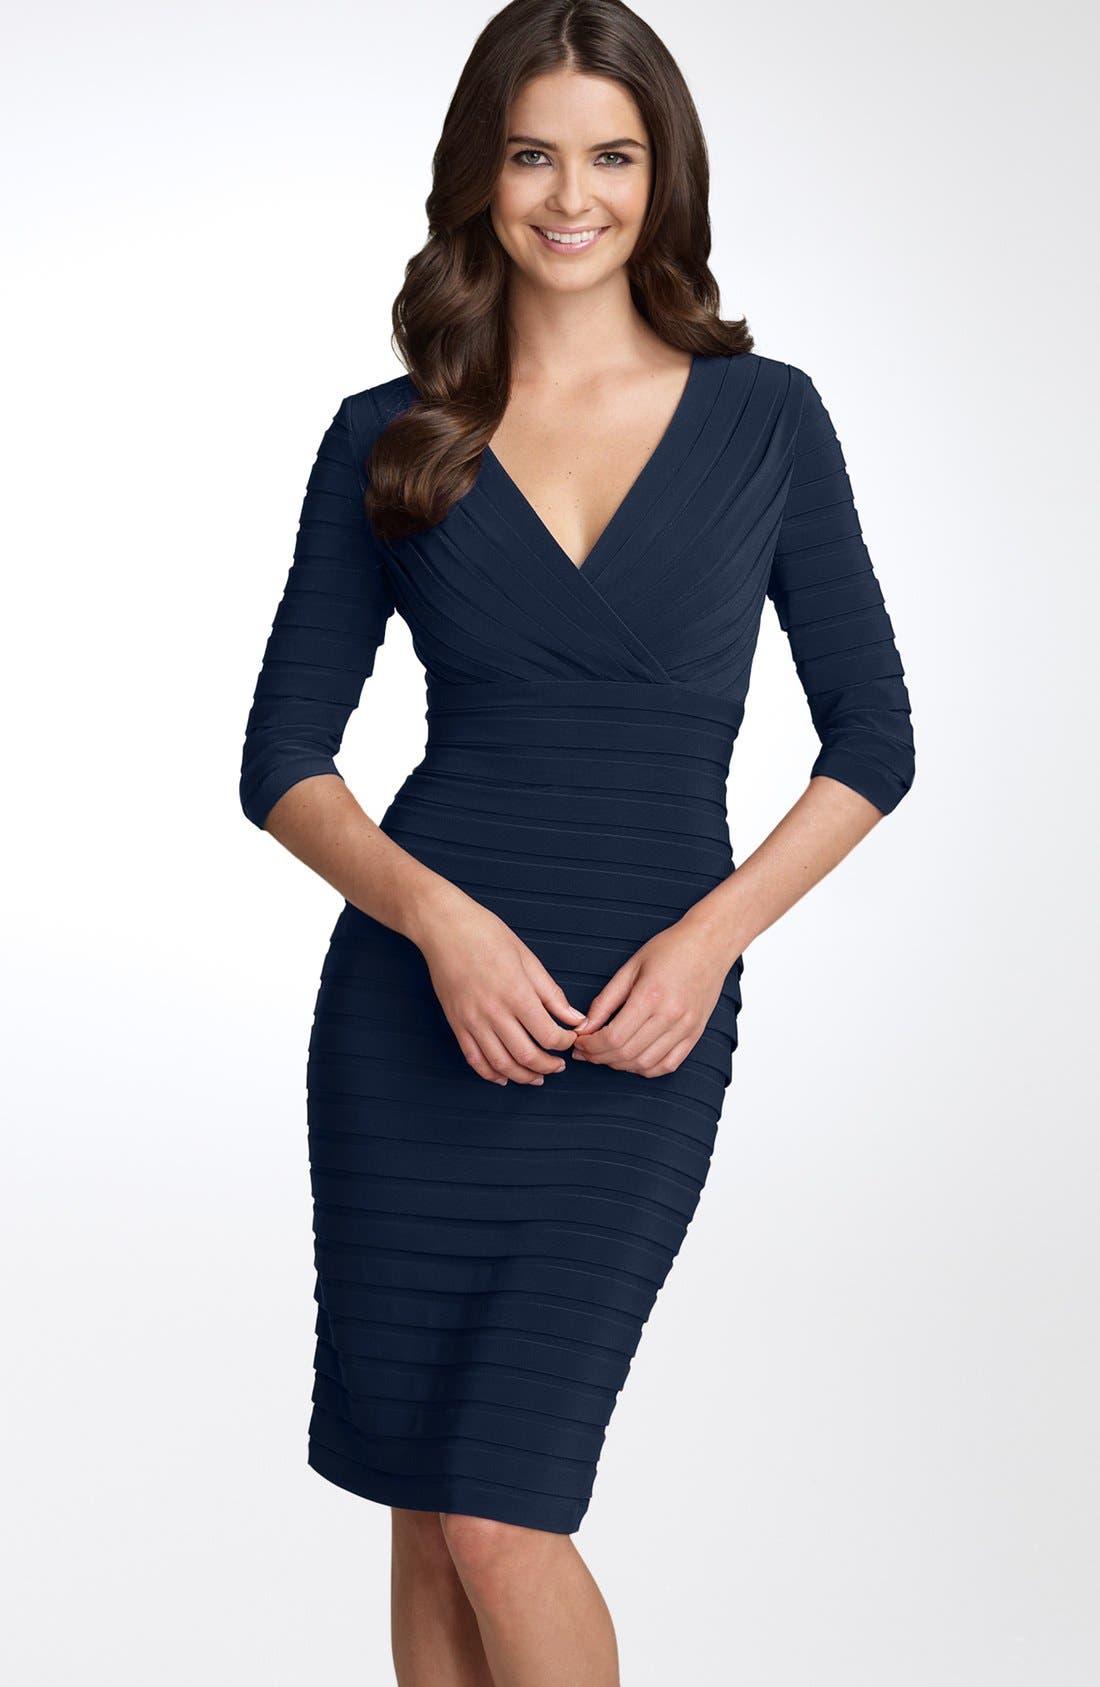 Alternate Image 1 Selected - Adrianna Papell Pleated Jersey Sheath Dress (Regular & Petite)